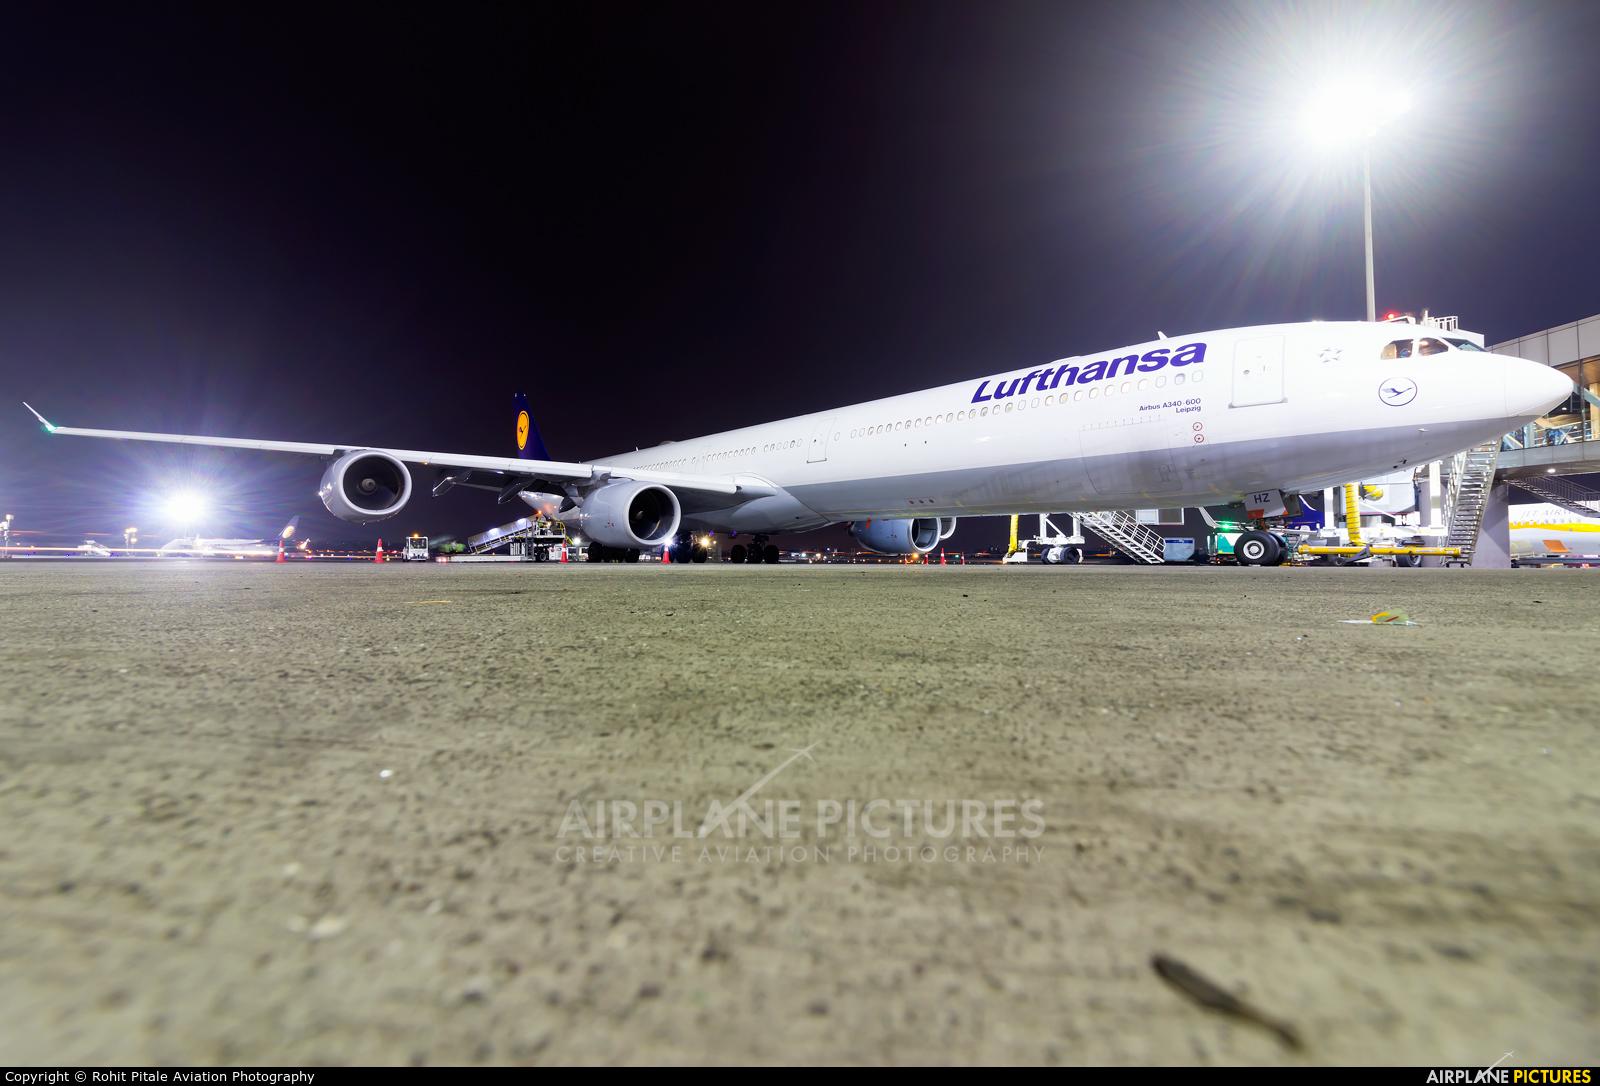 Lufthansa D-AIHZ aircraft at Mumbai - Chhatrapati Shivaji Intl